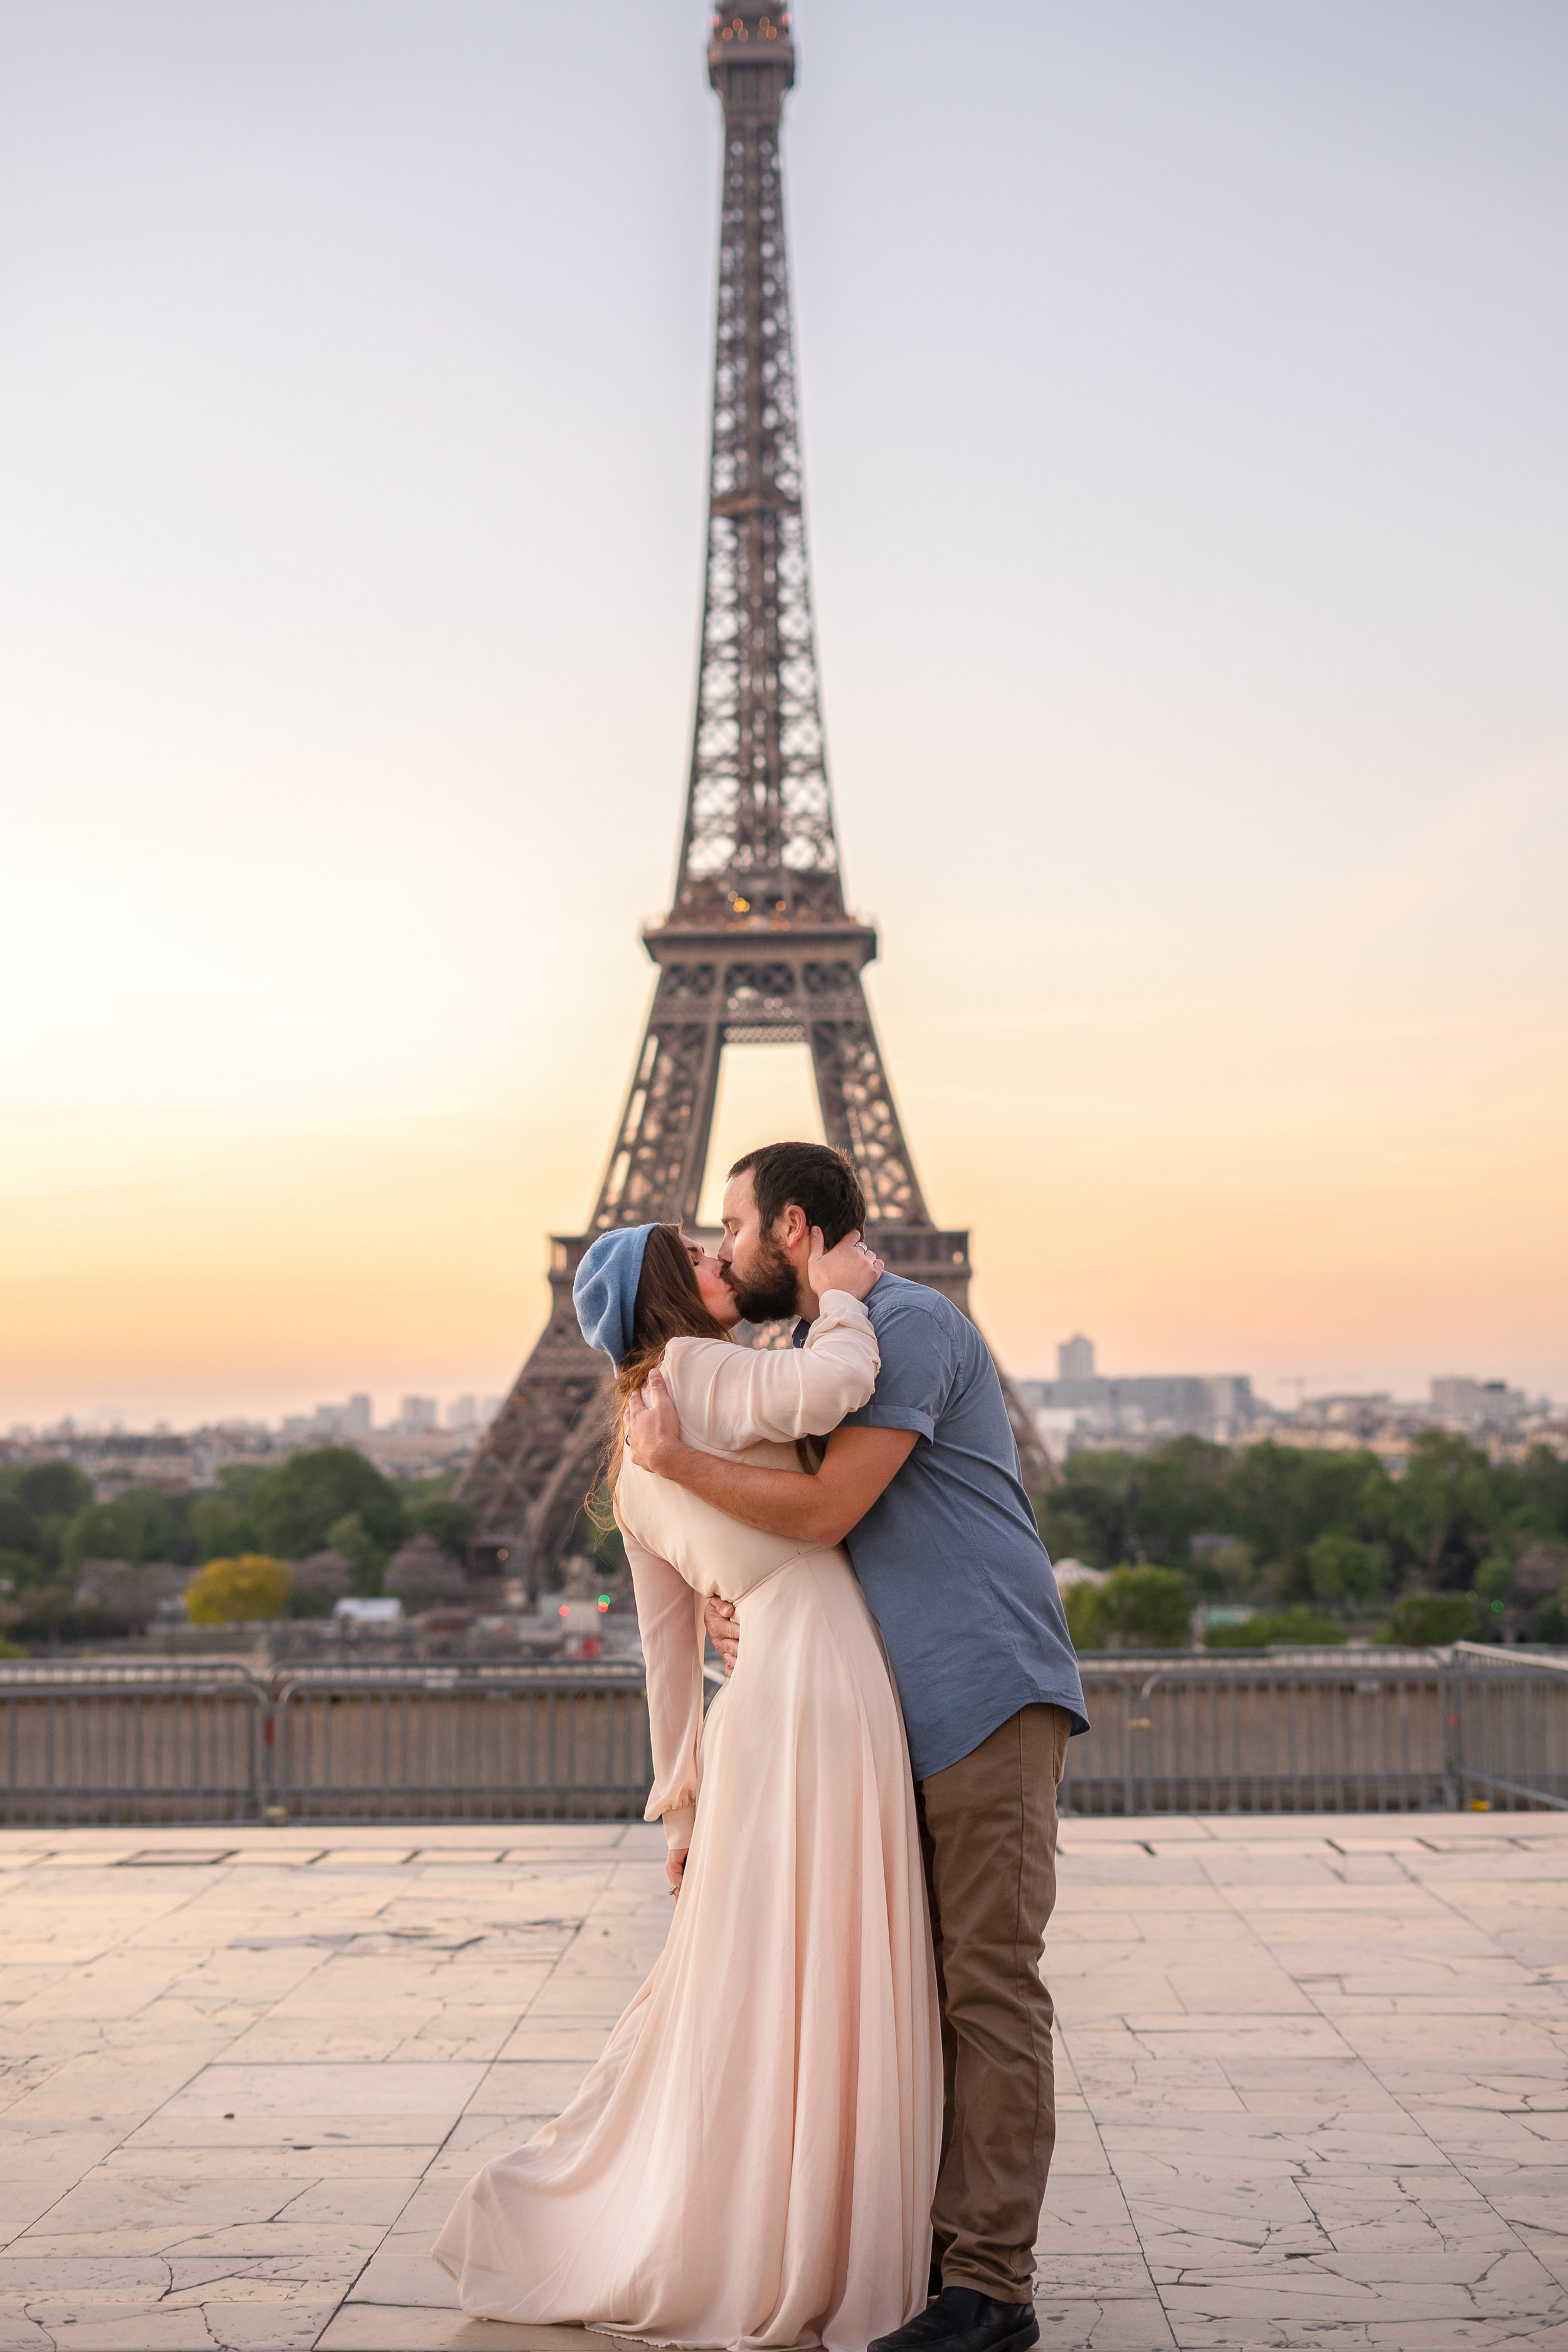 Eiffel Tower Virginia Gates Photography